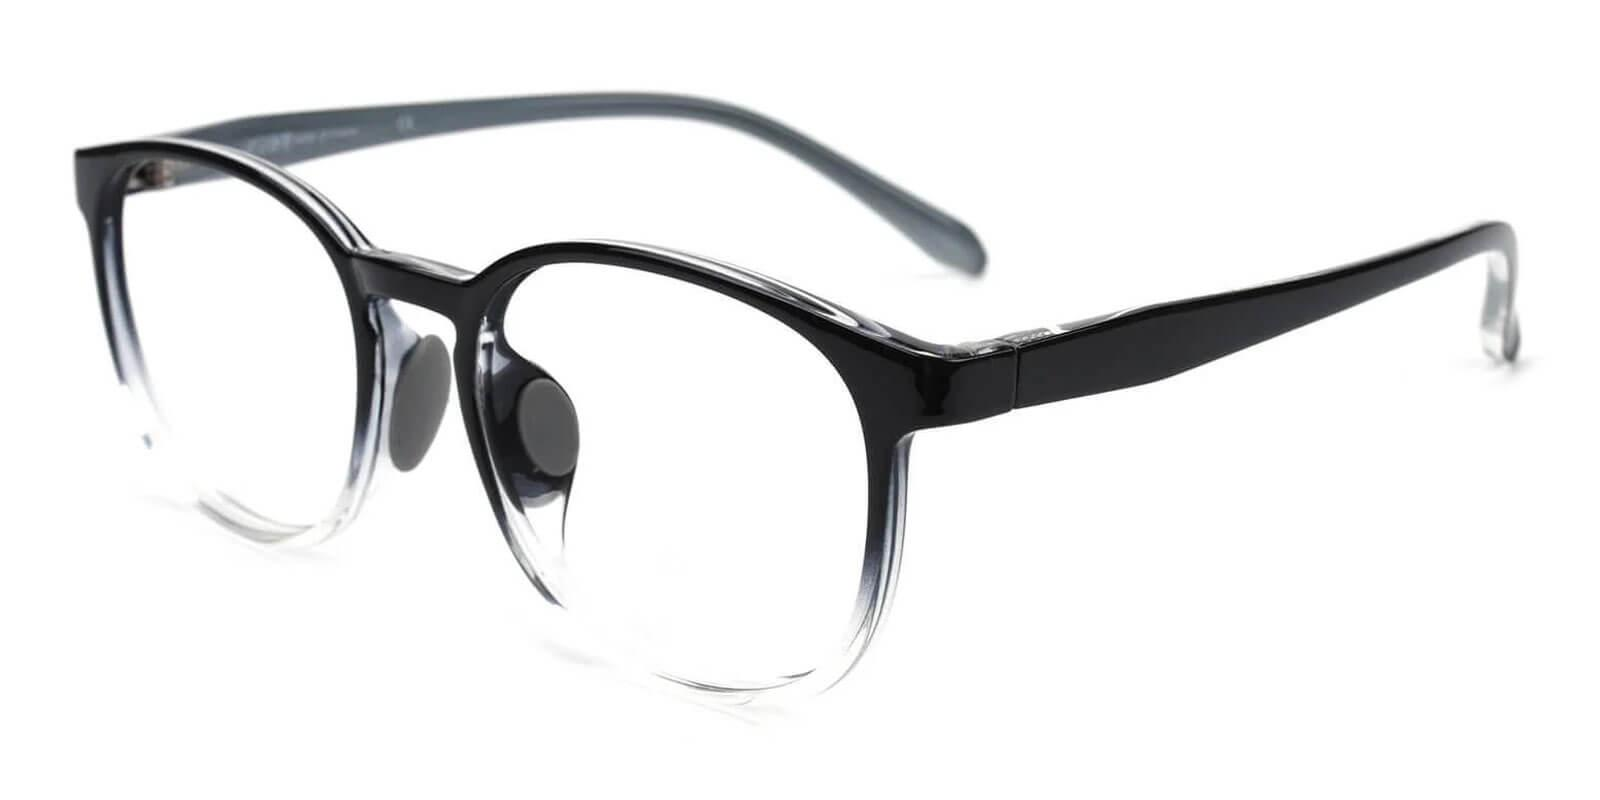 Alchemist Multicolor TR Eyeglasses , Lightweight , UniversalBridgeFit Frames from ABBE Glasses